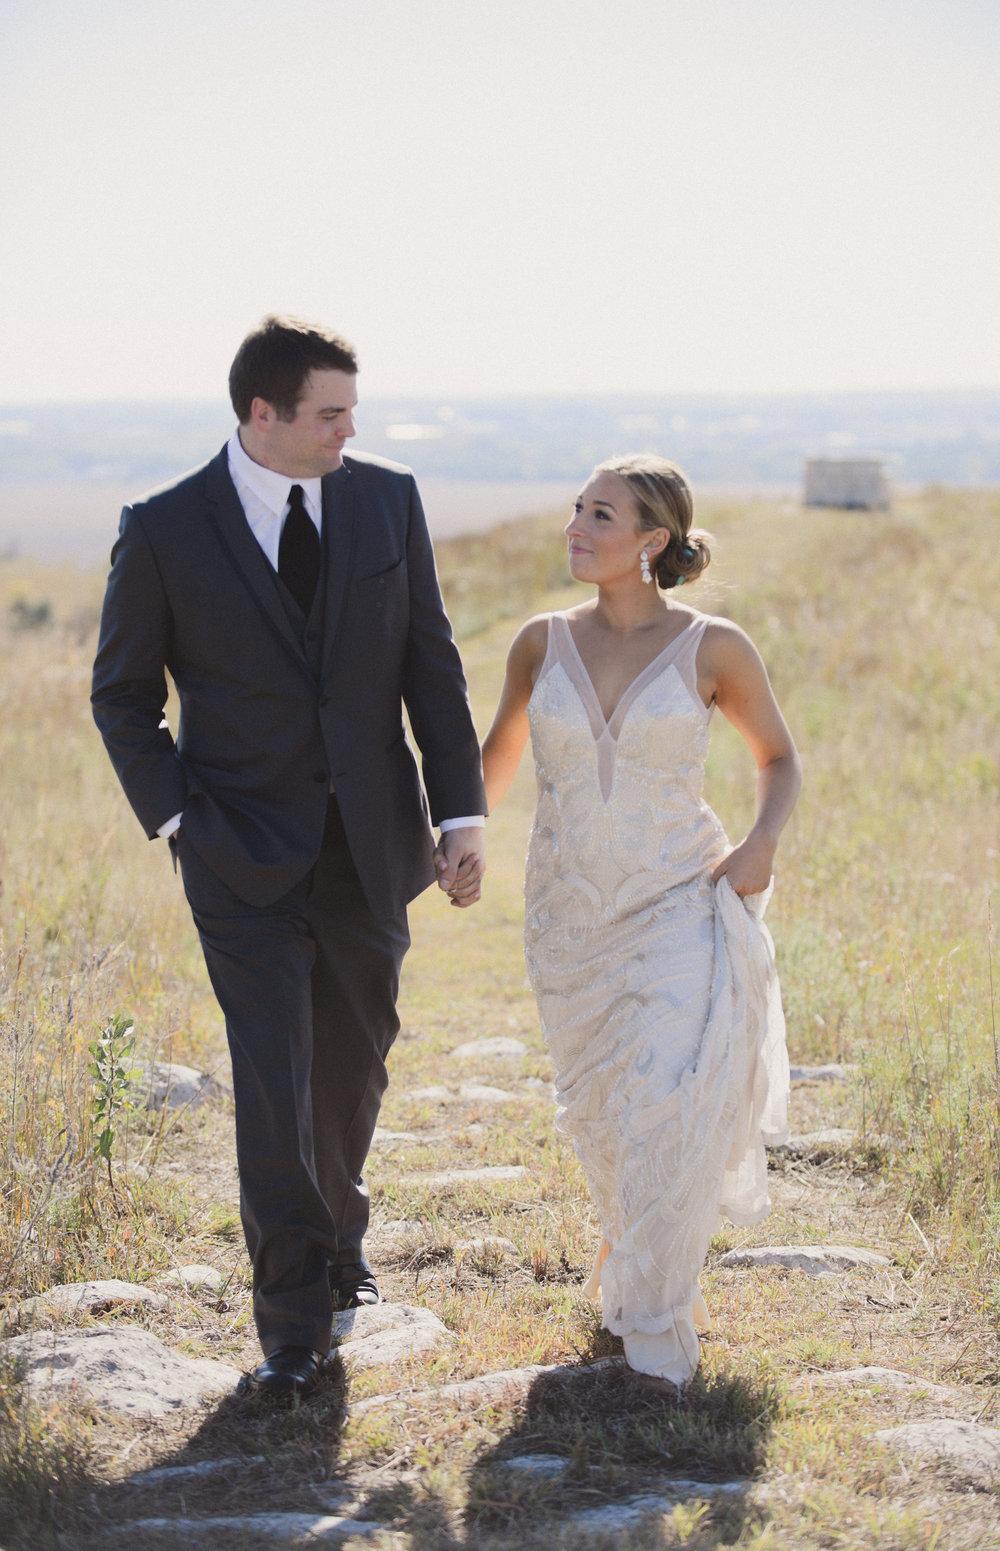 October 2014.We got married on the ranch I grew up on in Manhattan, Kansas. #ottosontheprairie